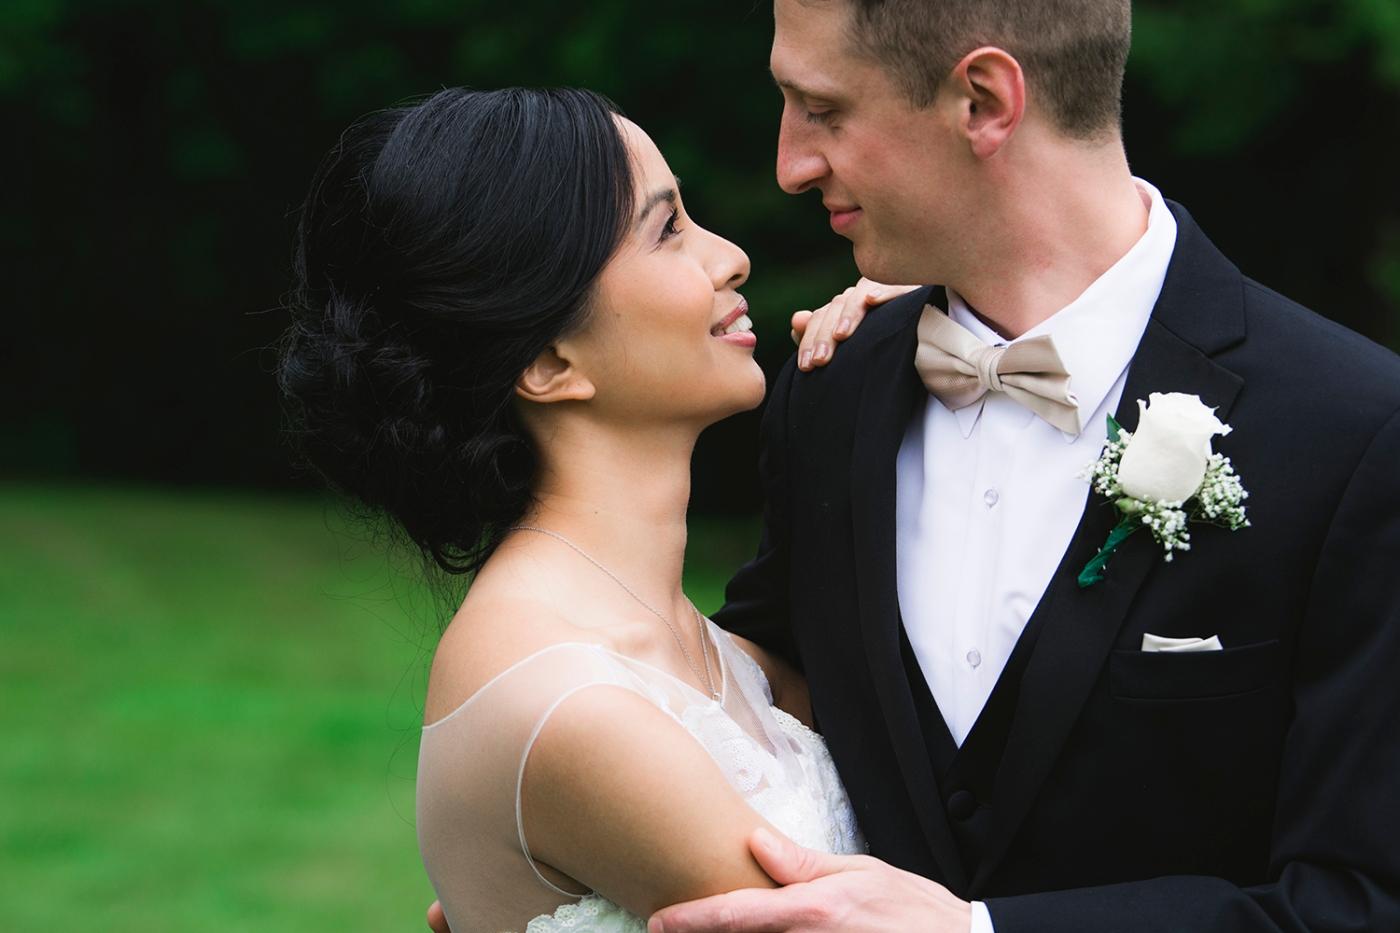 Jane_Speleers_2016_arriving to reception _Wedding_Wild_Rose_Estates_VenueJS7_7657